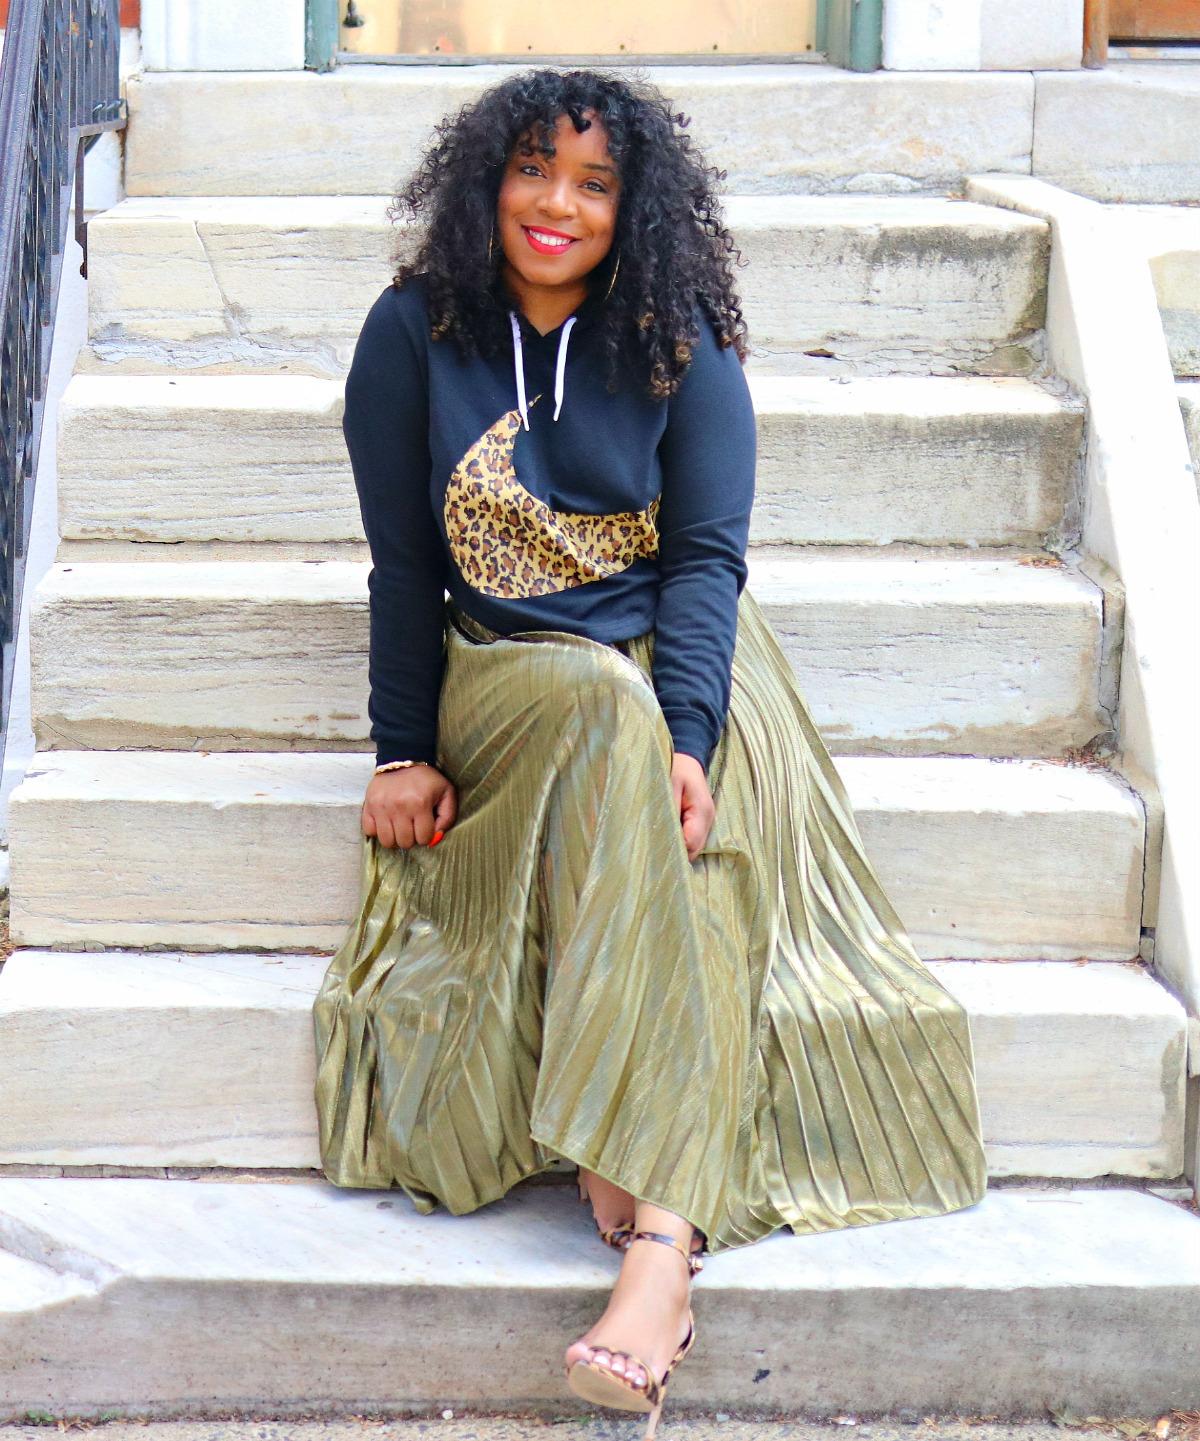 Style & Poise: Leopard Nike Sweatshirt, Metallic Pleated Skirt, Leopard Sandals. Athleisure